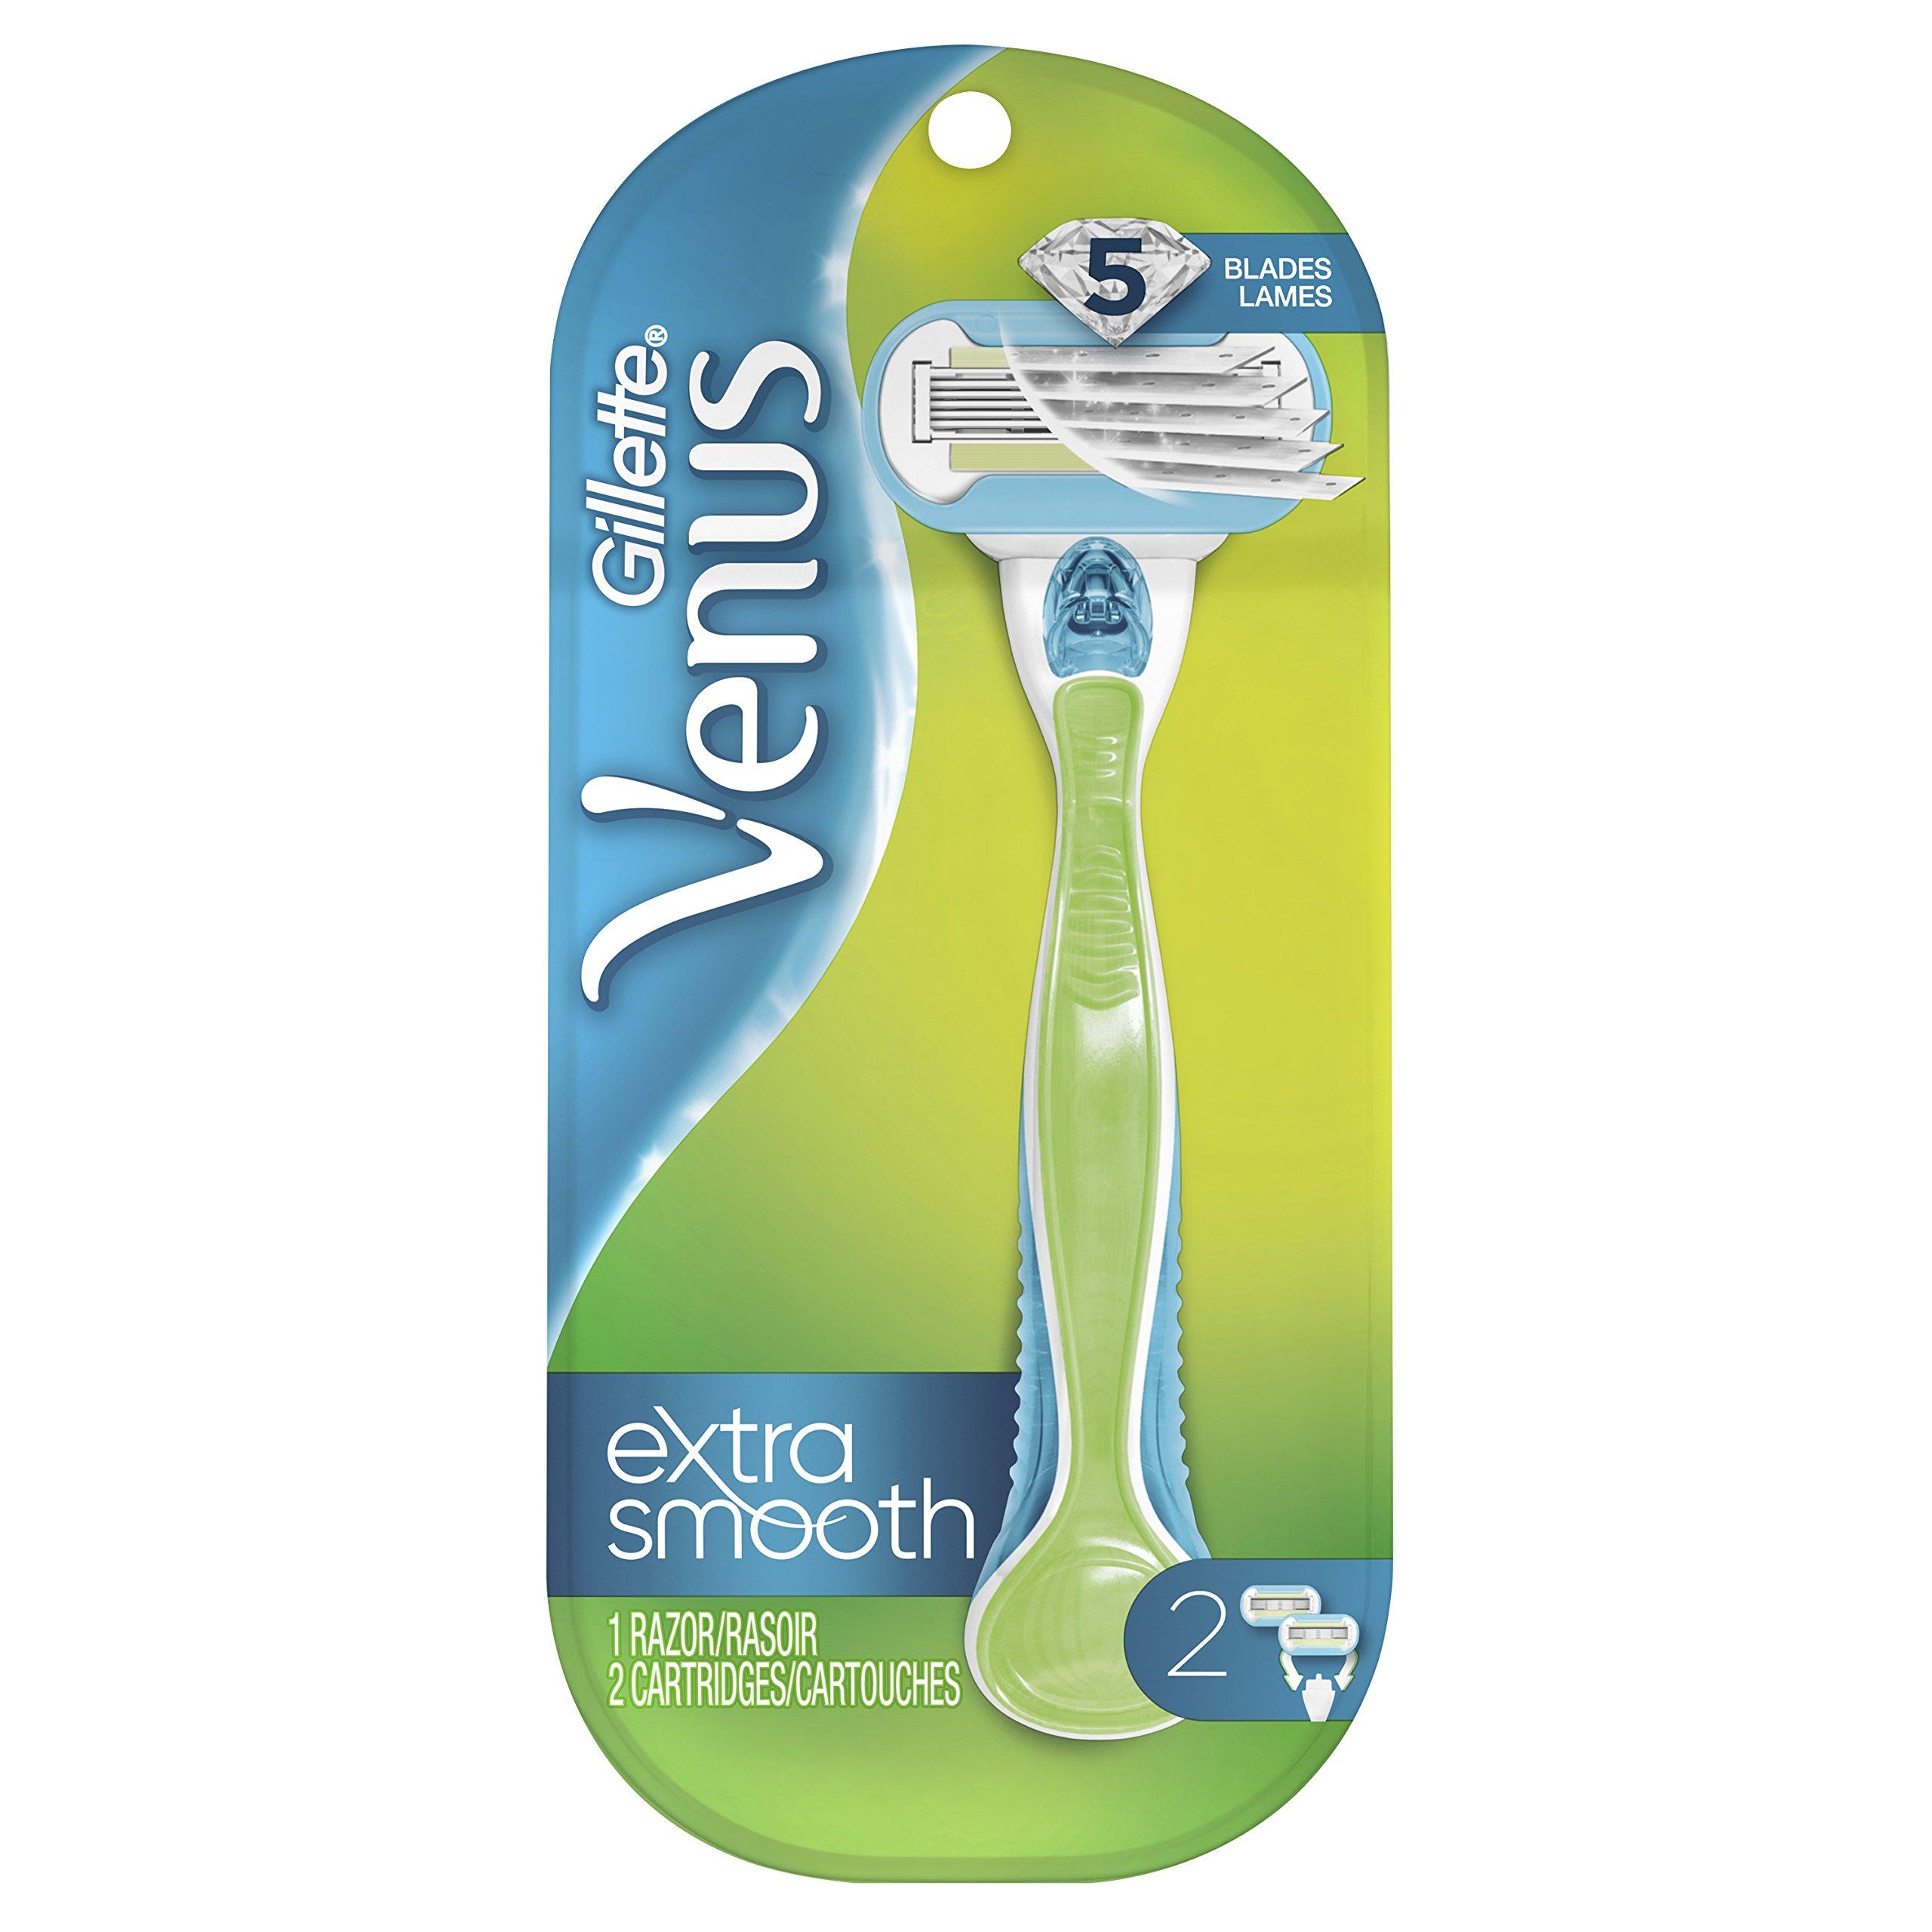 Gillette Venus Extra Smooth Green Women's Razor  - 1 handle + 2 Refills